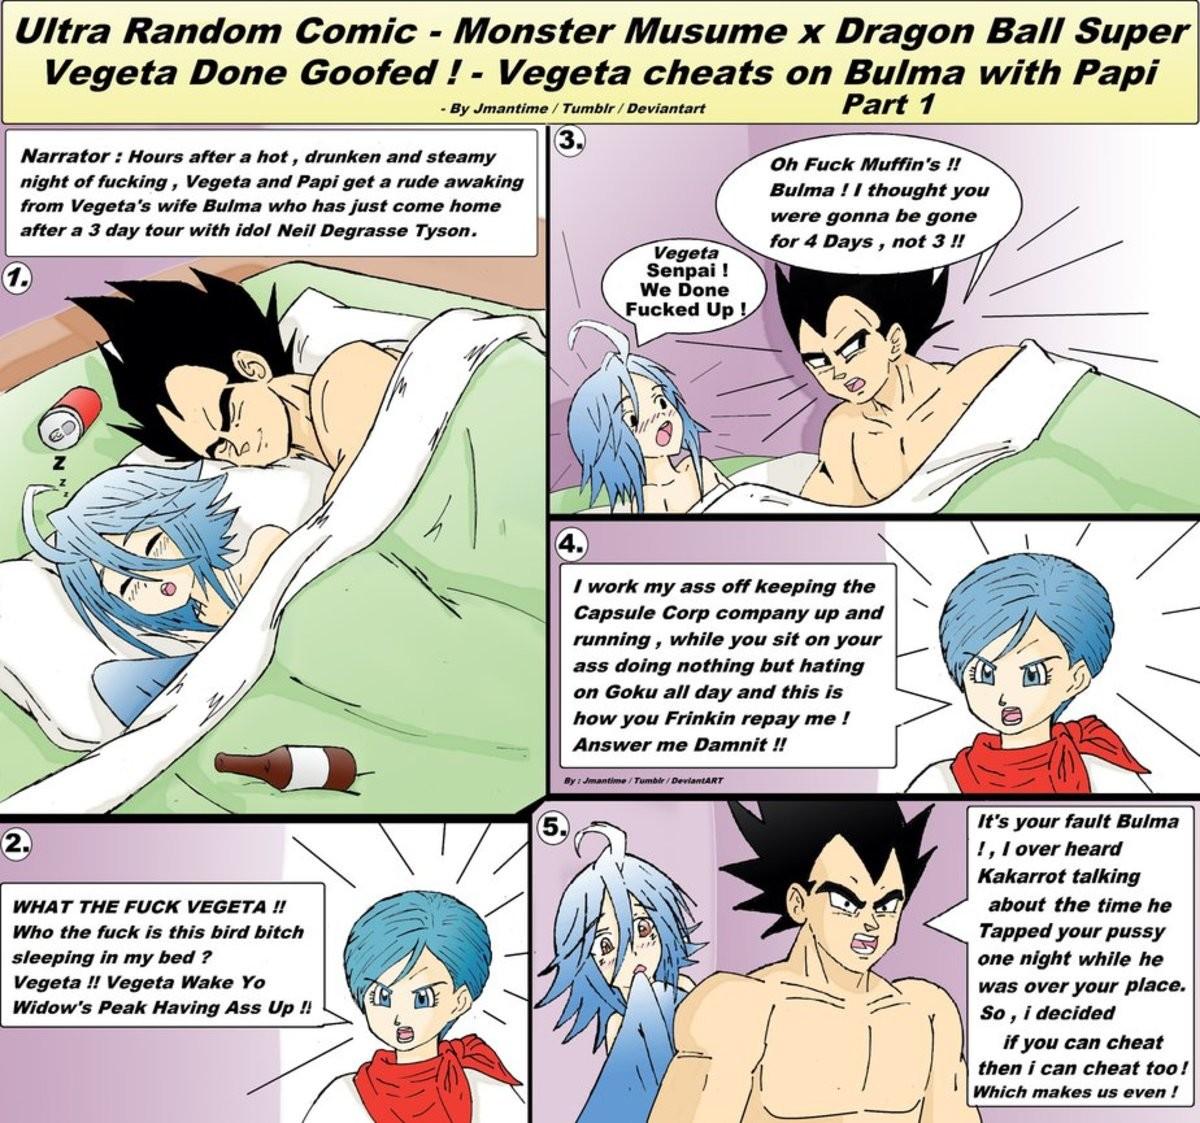 Papi's Original Playmate!. . Ultra Random Comic - Monster Musume It Dragon Ball Super I/ quota Done (holed i - Vega he cheats on Bulma with Papi ham Ii' ayato'.